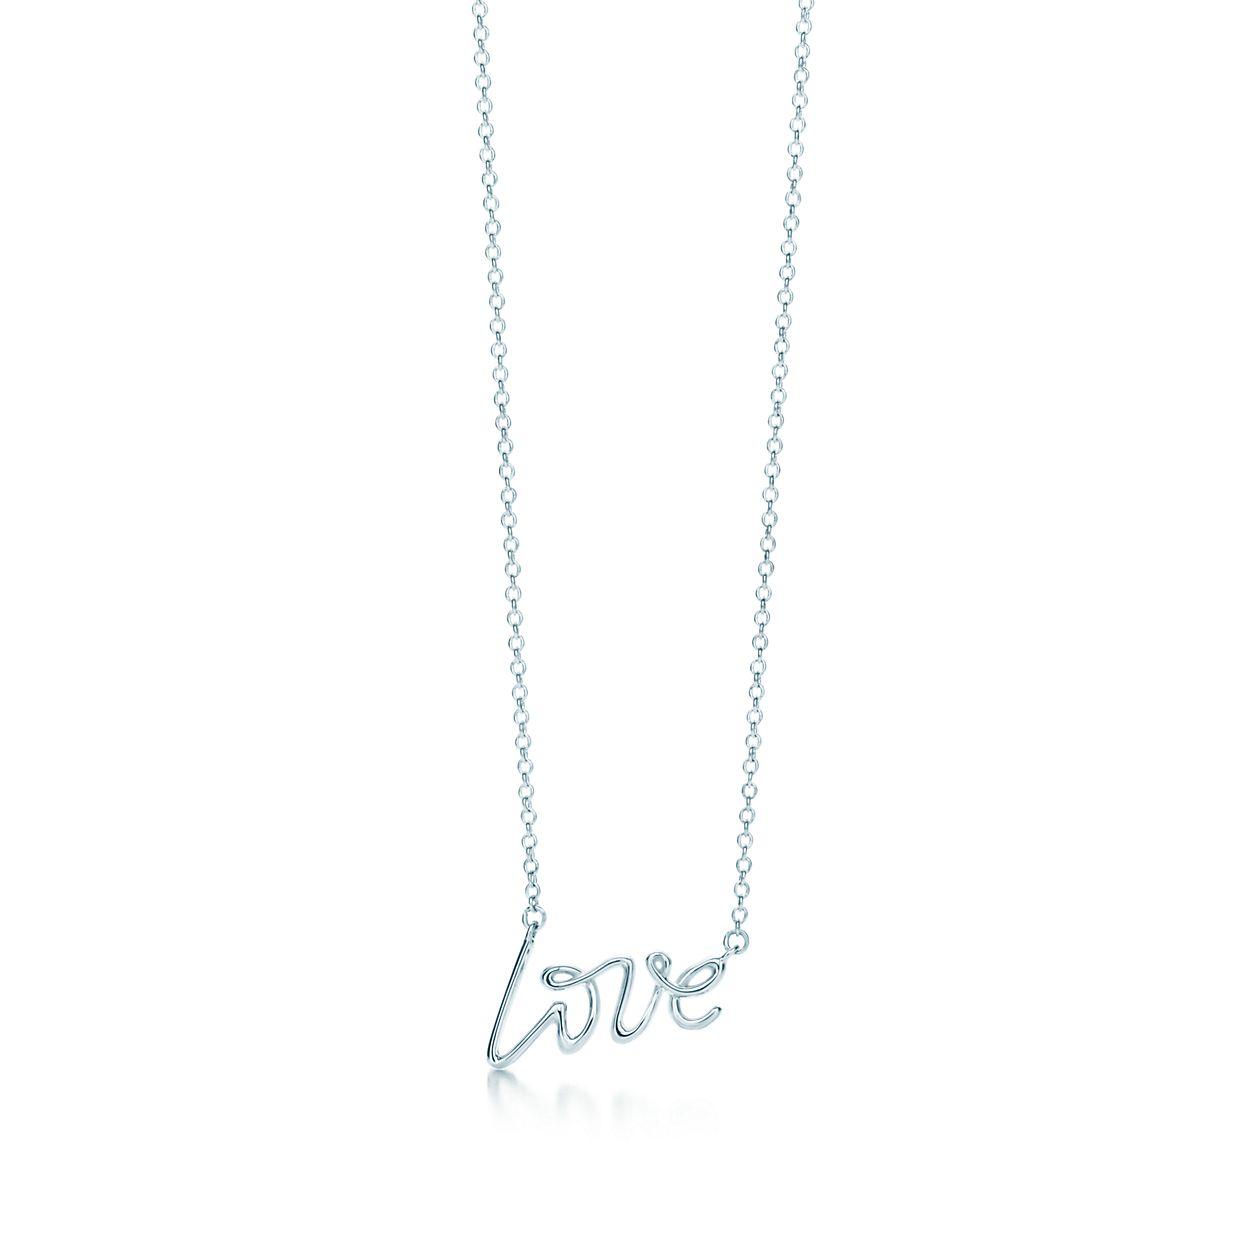 Tiffany & Co Love Pendant